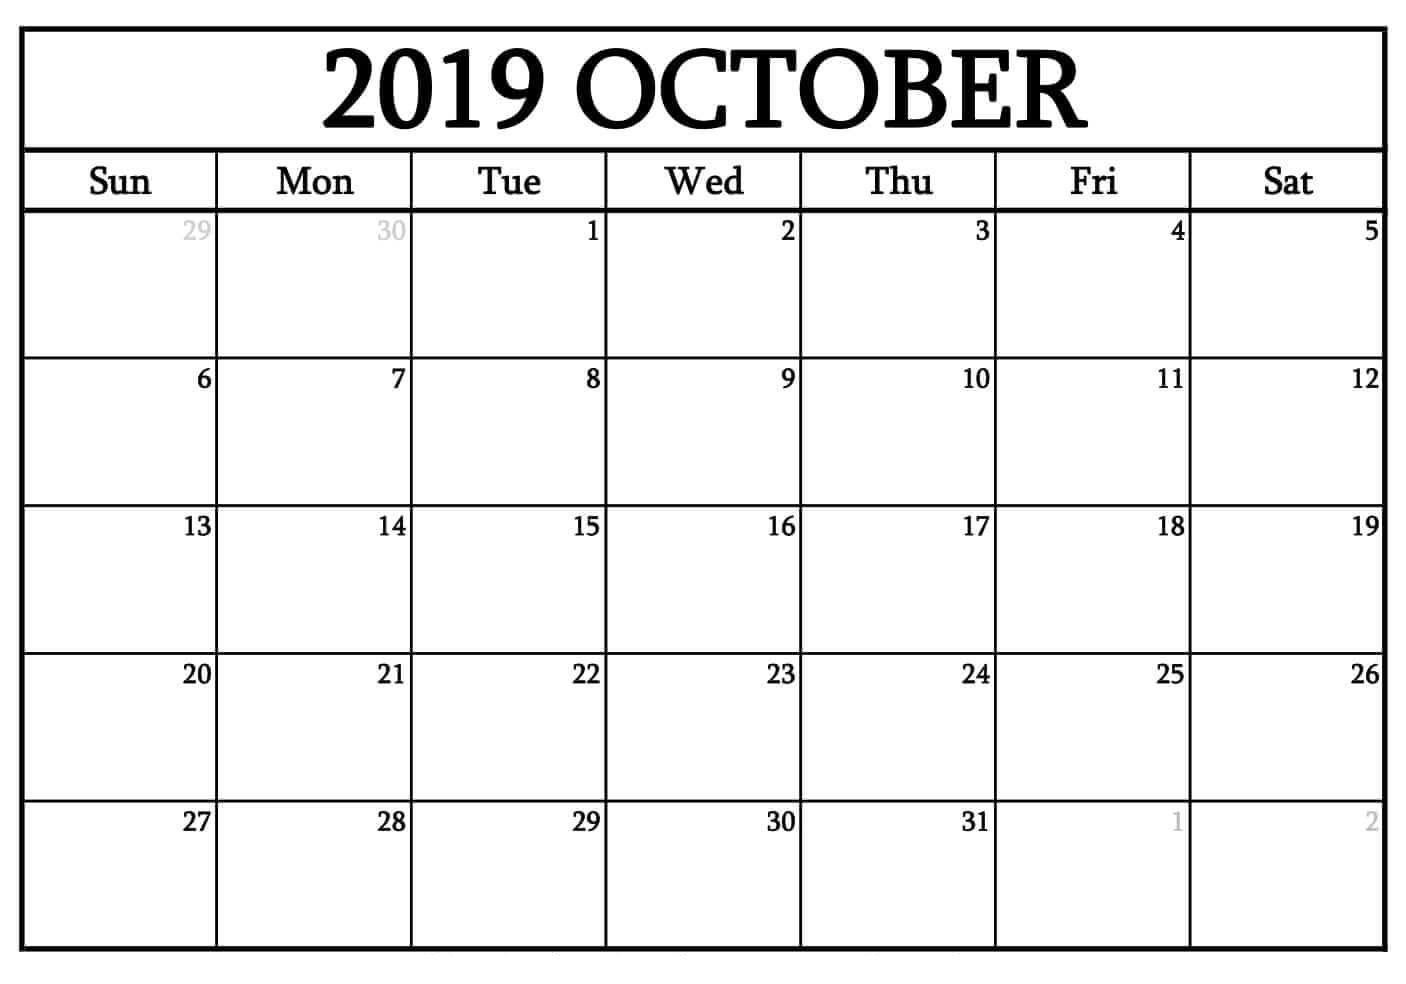 Blank October 2019 Calendar Word - Free Printable Calendar